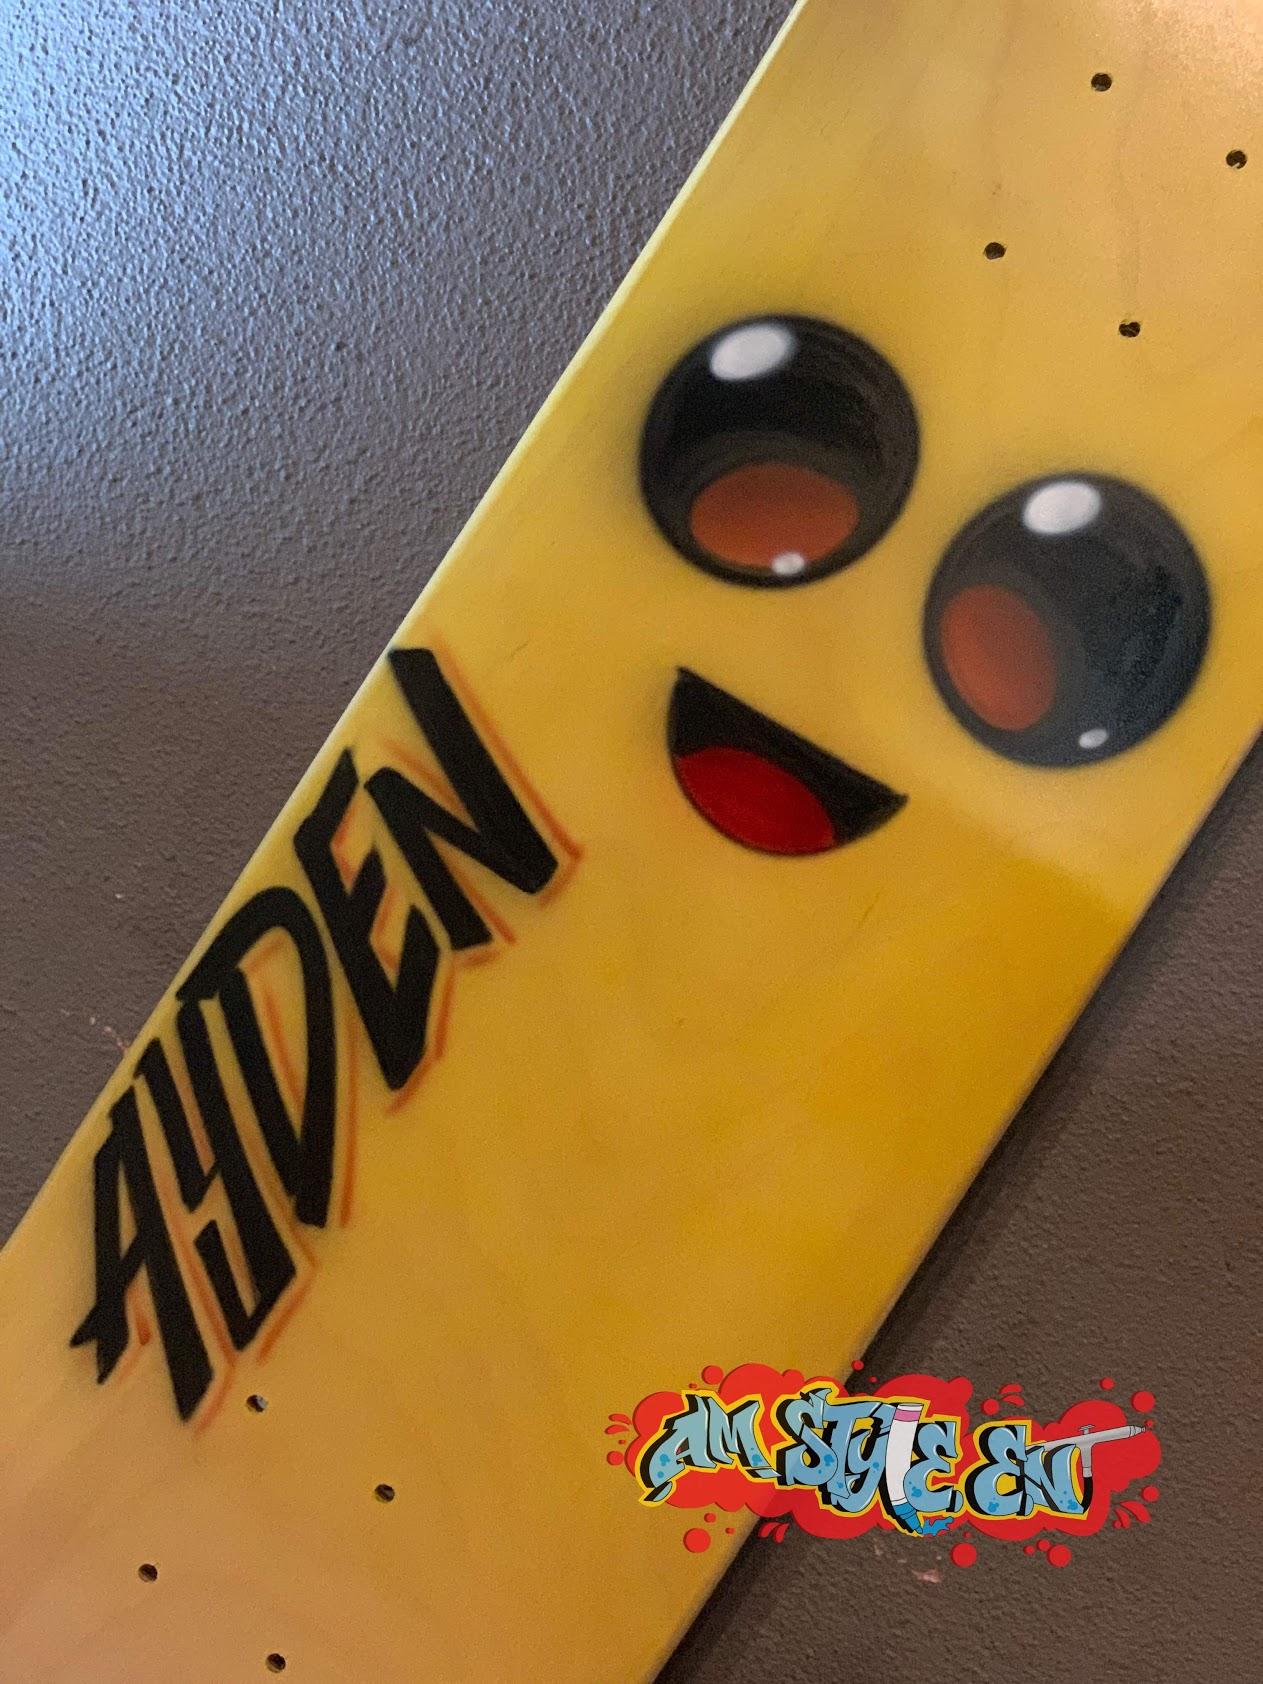 Airbrush Skateboard Party Favor